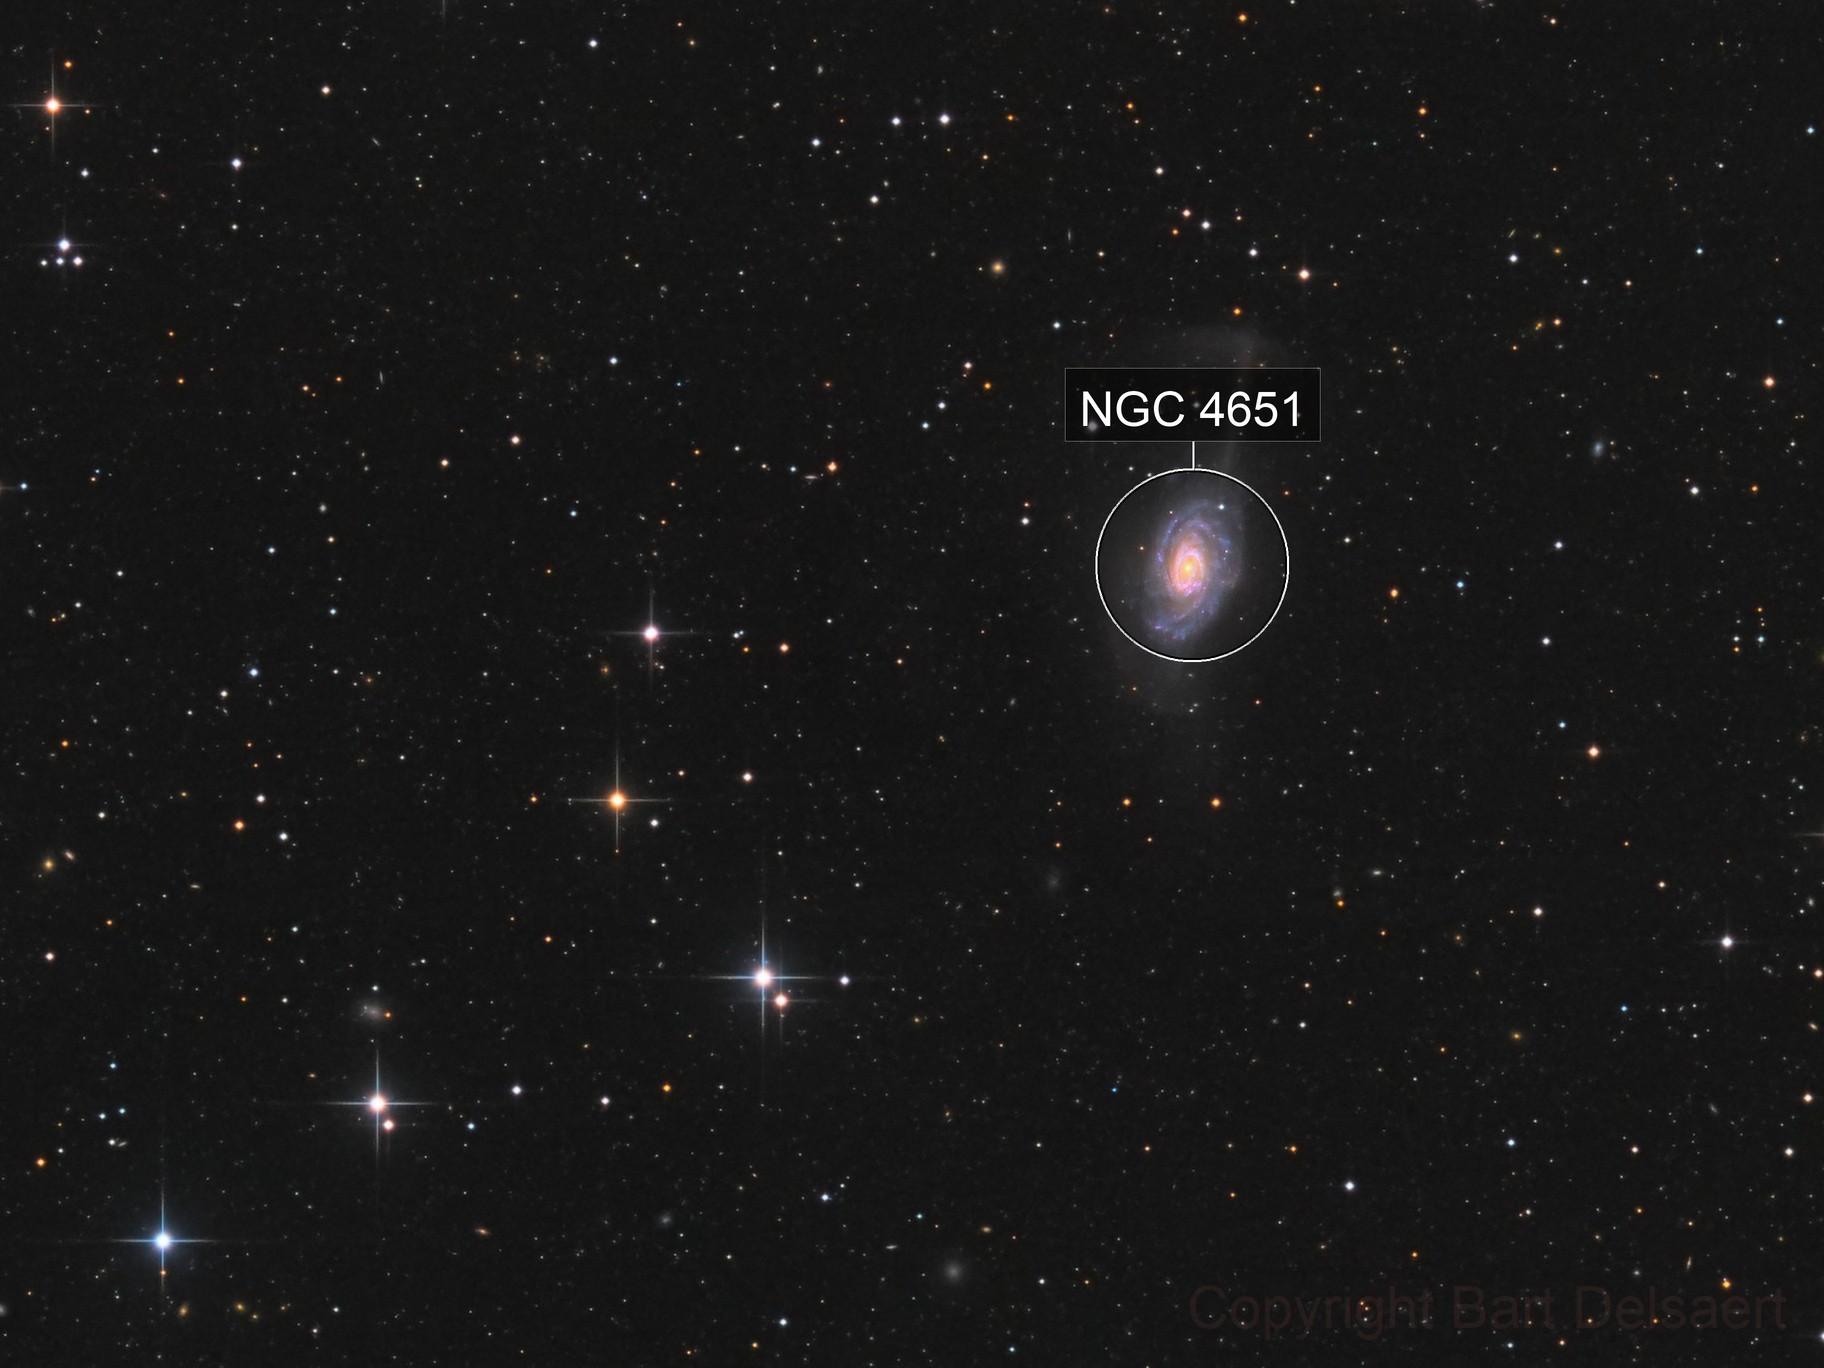 NGC 4651 - The Umbrella Galaxy